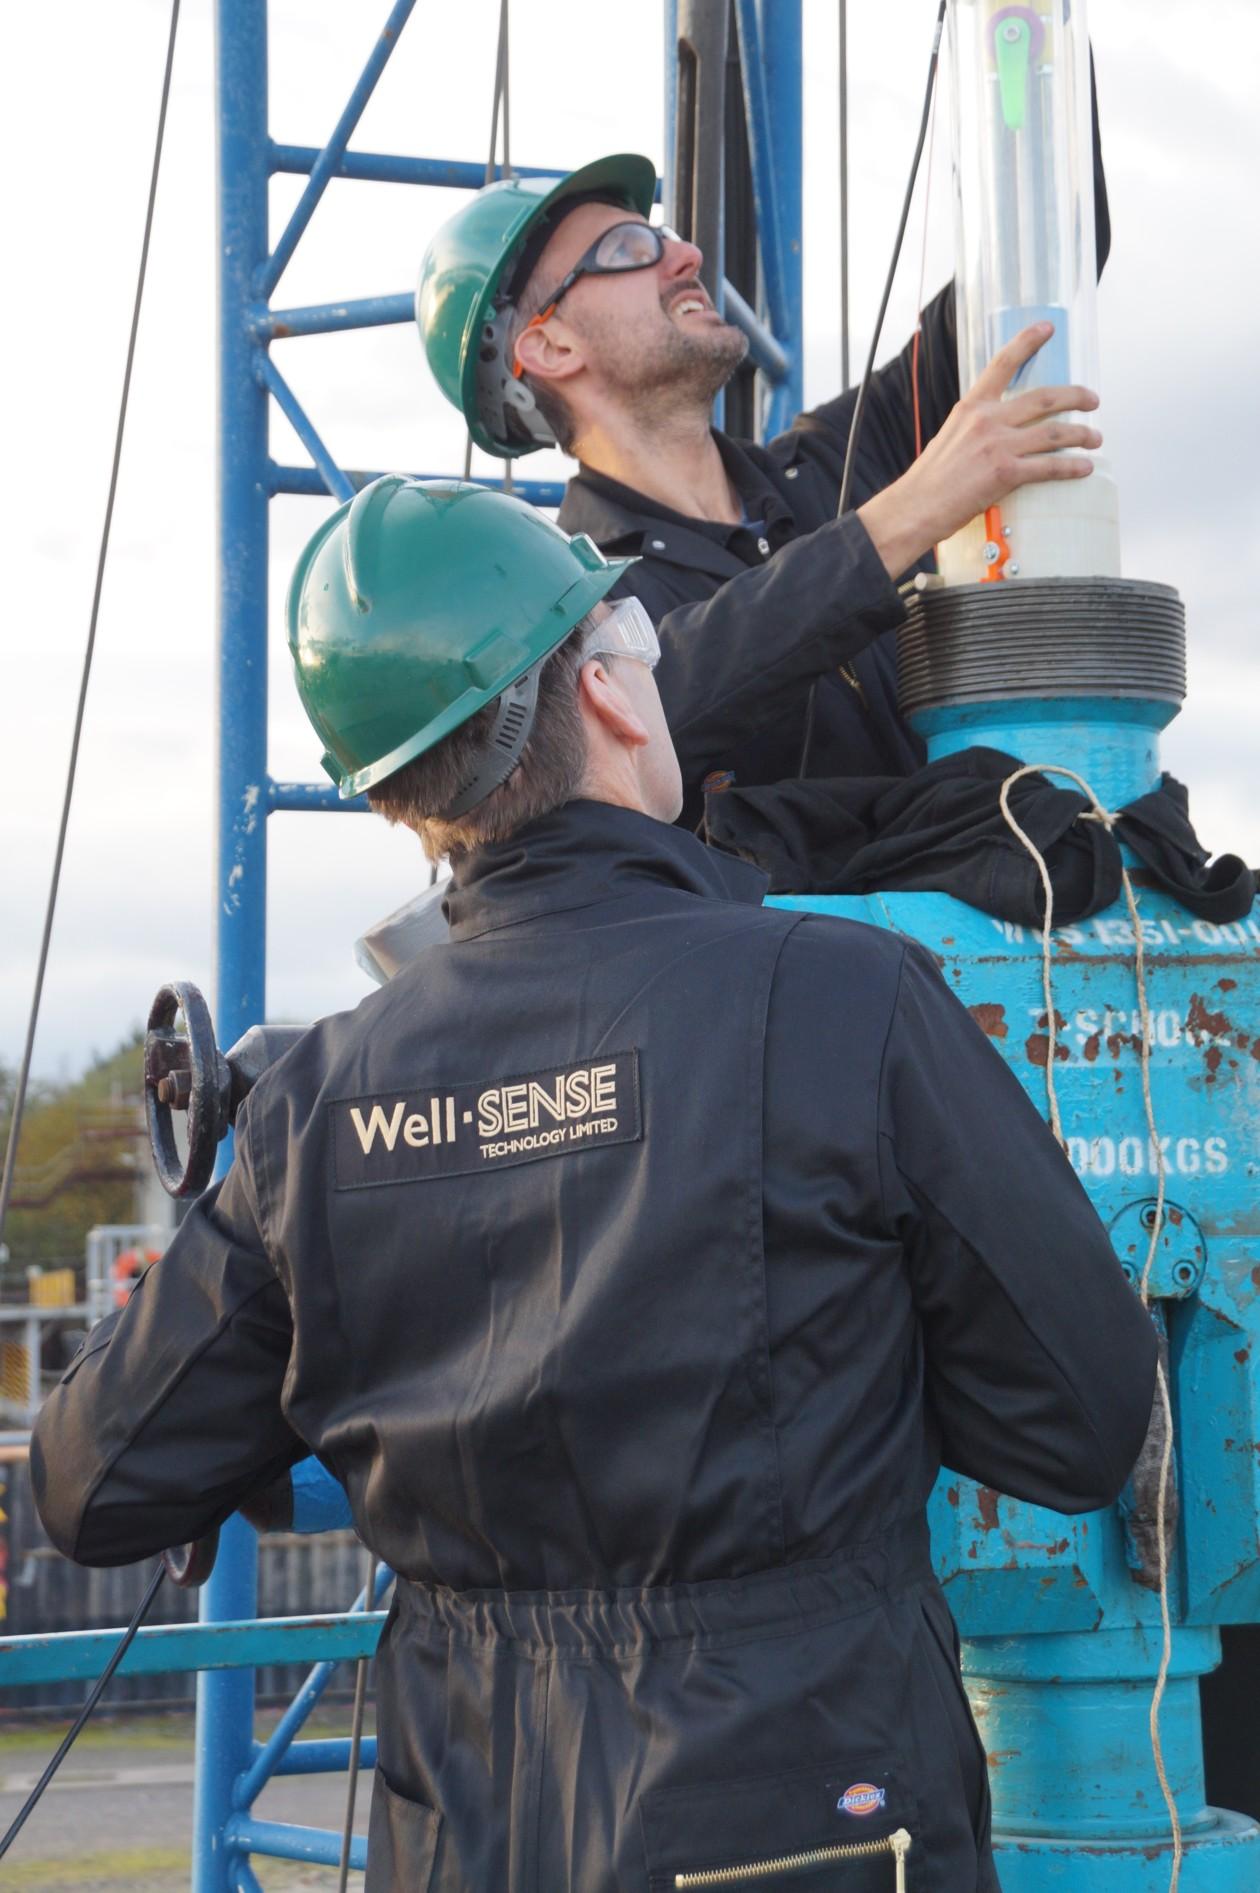 Well-SENSE Technology's FLI Achieves Success in US Field Trials